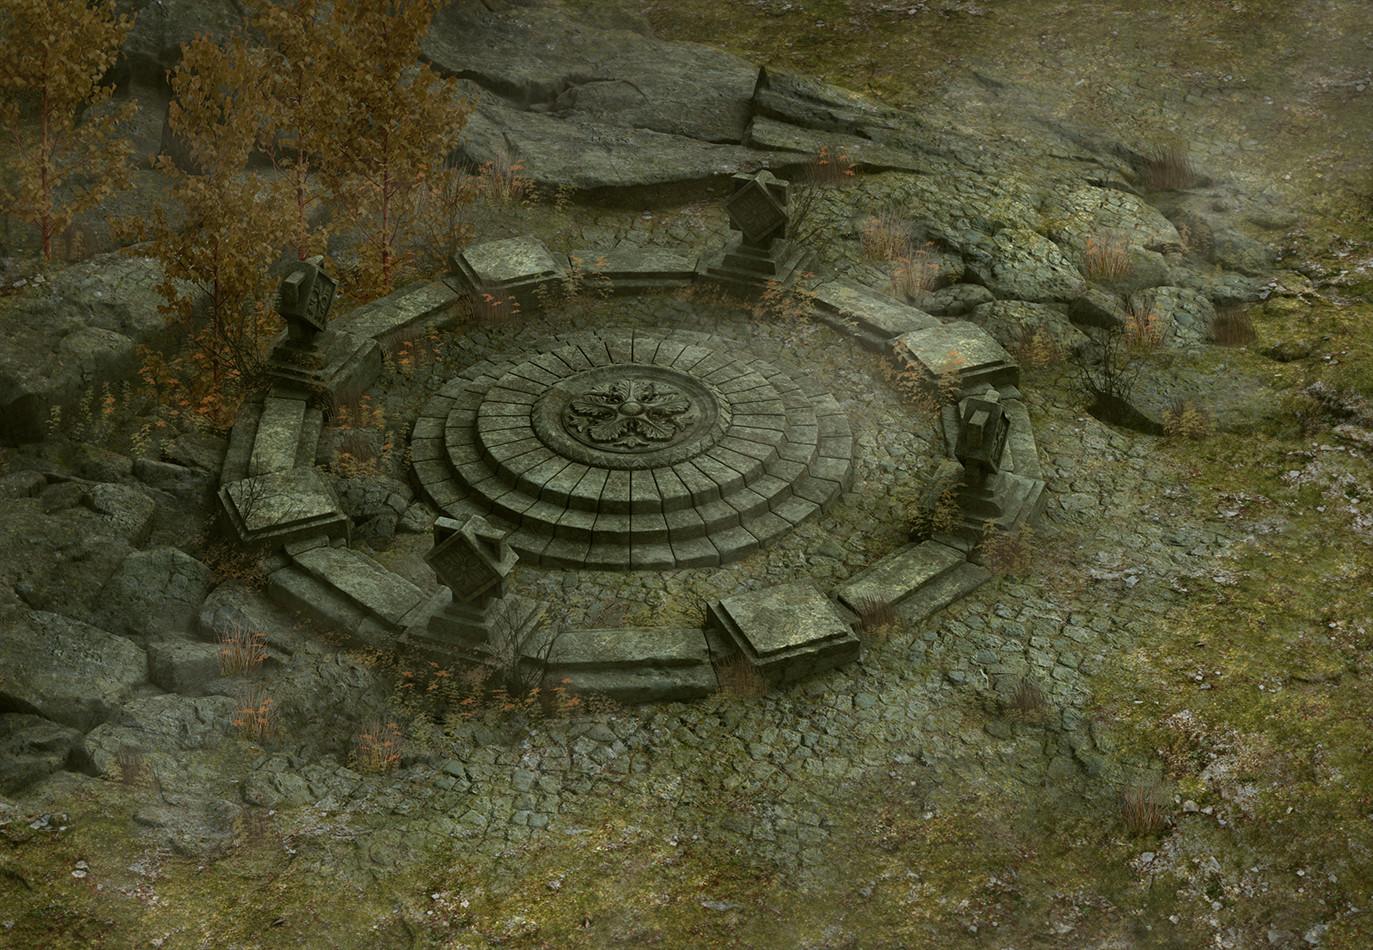 Ste flack stone circle day